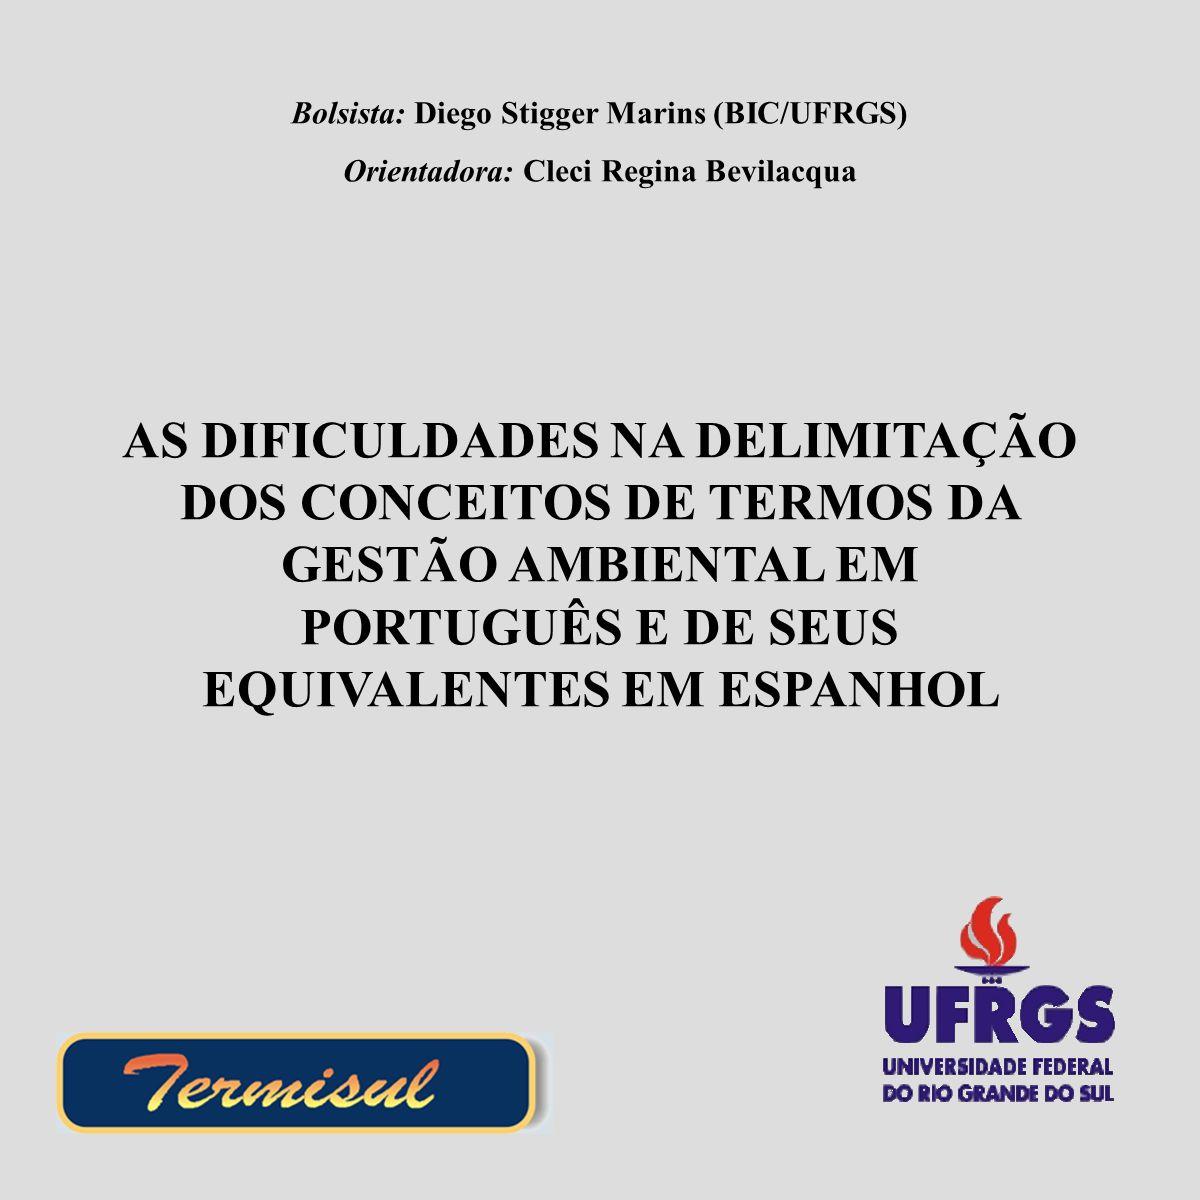 Bolsista: Diego Stigger Marins (BIC/UFRGS)